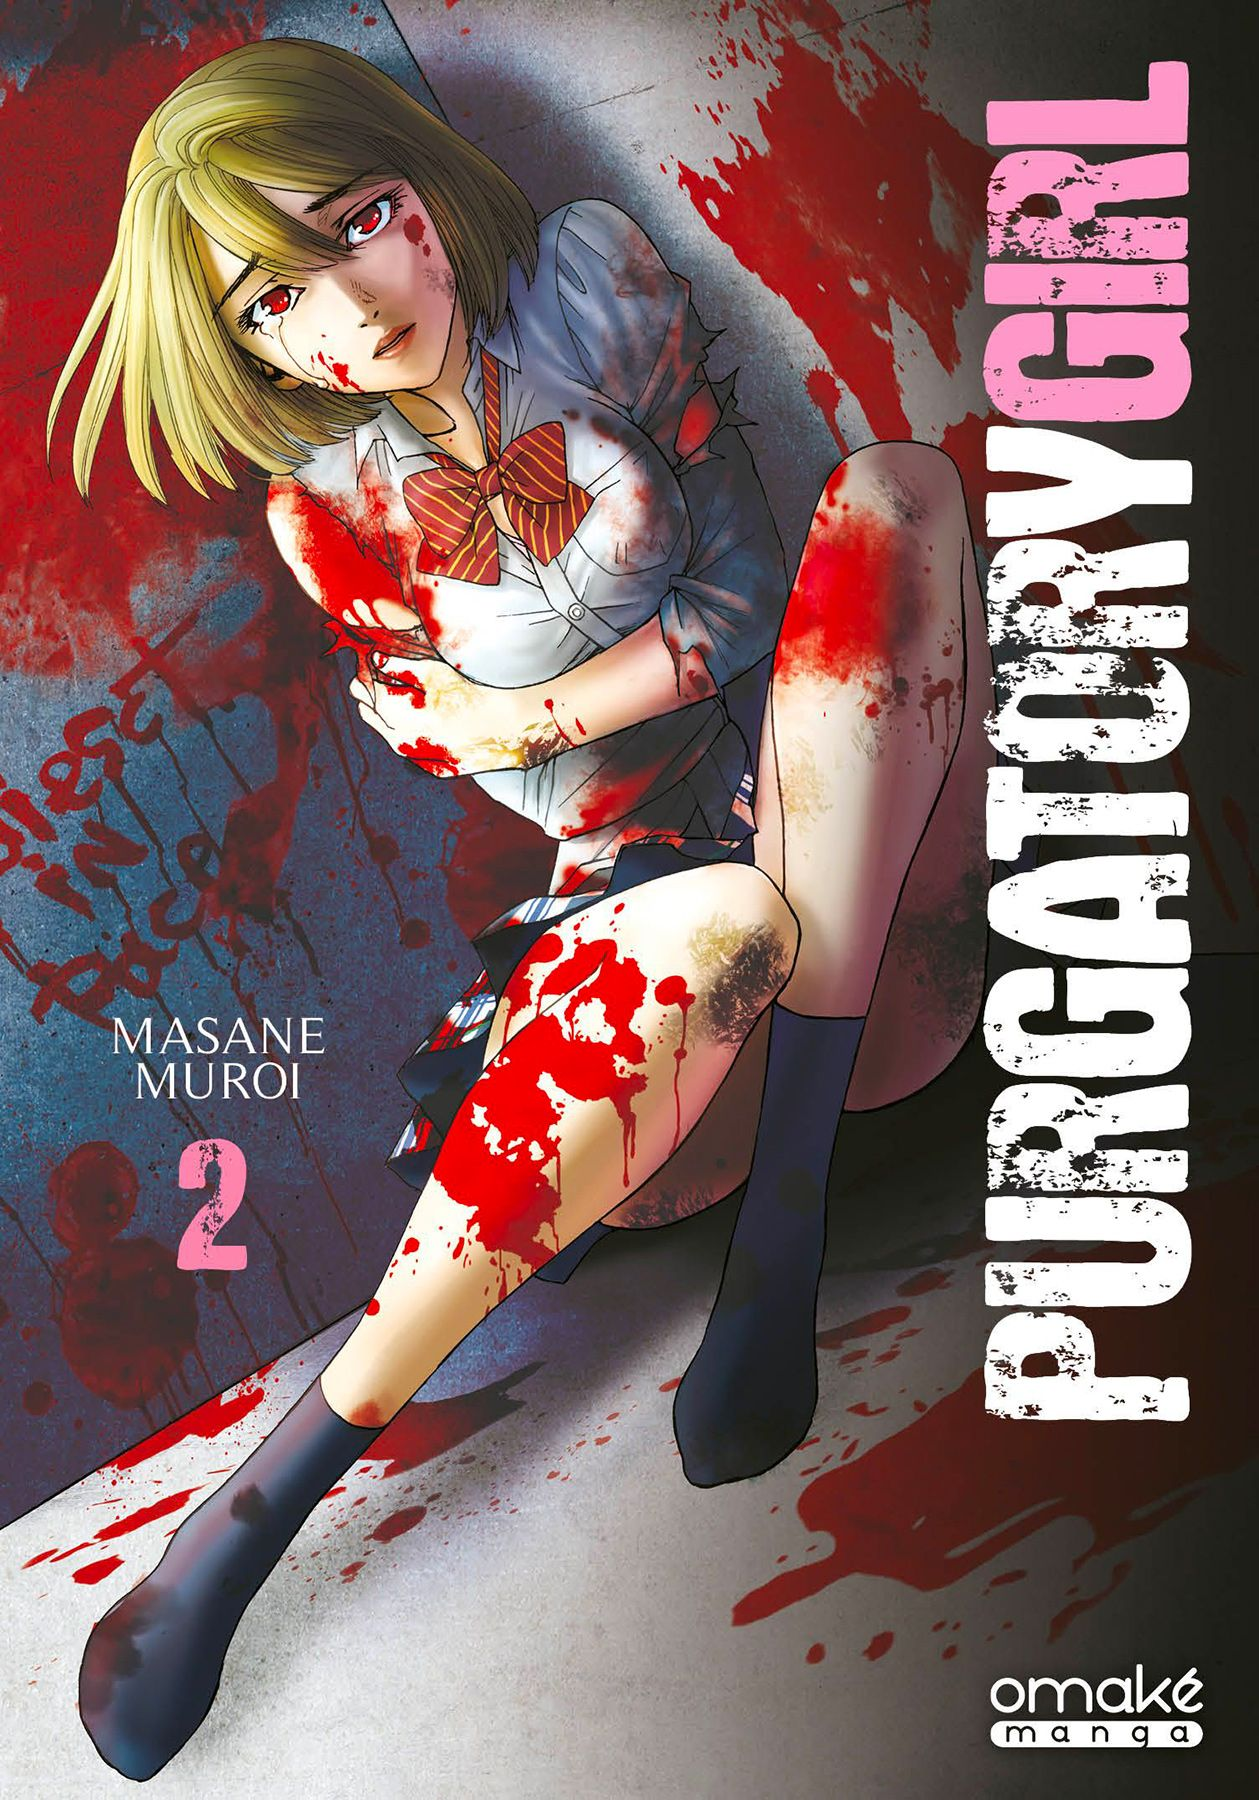 Sortie Manga au Québec JUIN 2021 Purgatory-girl-2-omake